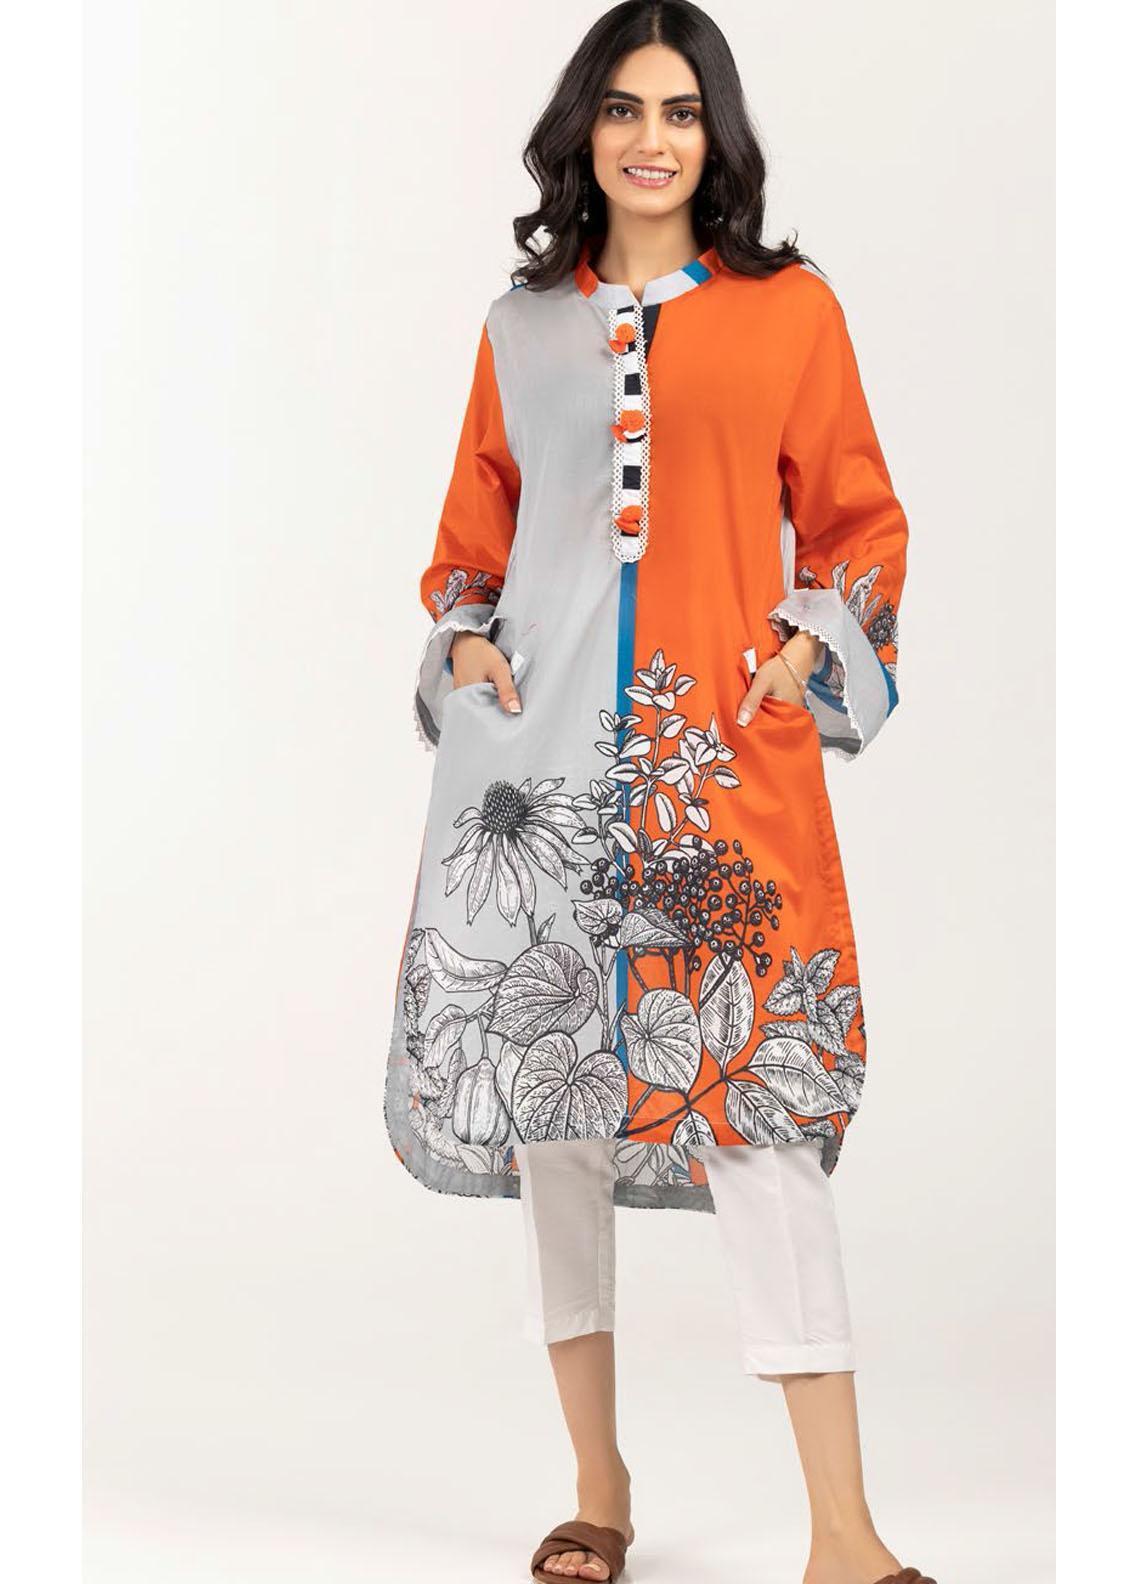 Gul Ahmed Luxury Pret Embroidered Lawn Kurties GA21K WGK-LWS-DP-433